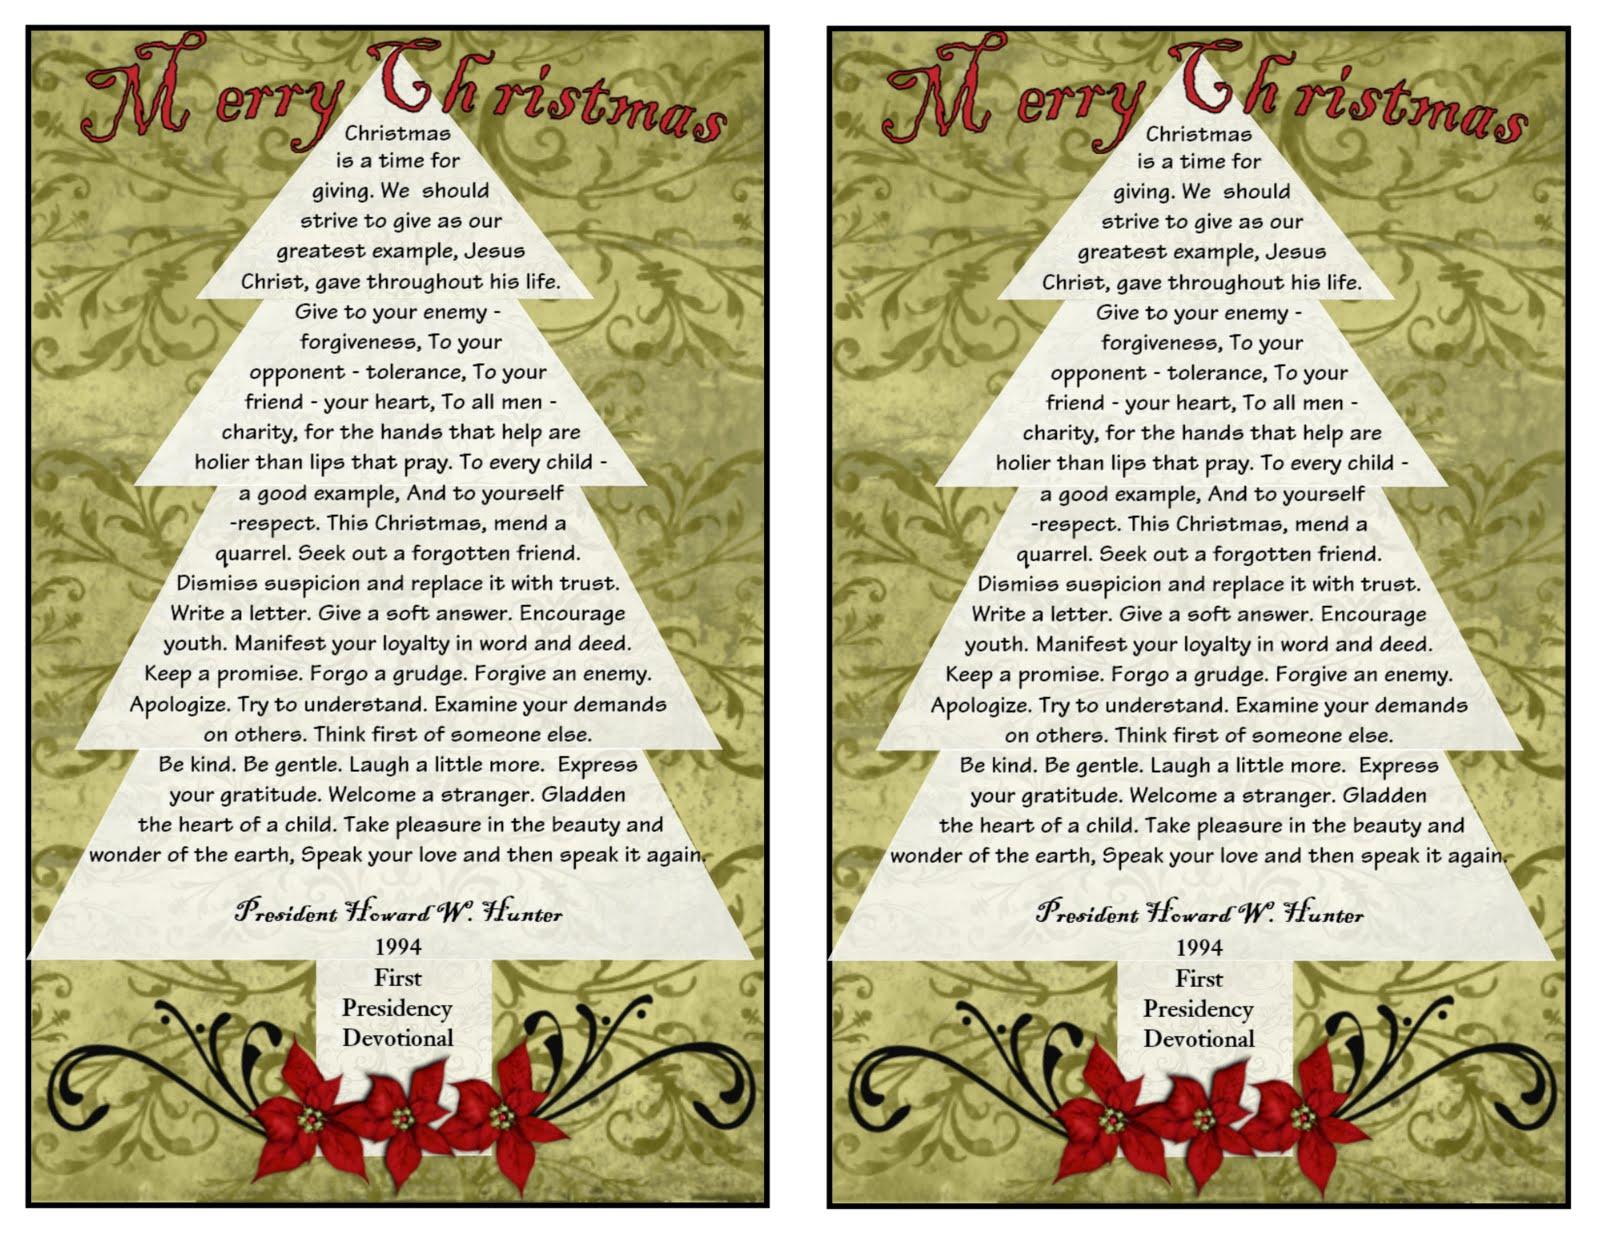 Lds Christmas Message 2020 President Monson Christmas Message 2020 Movie | Apqmpp.meganewyear